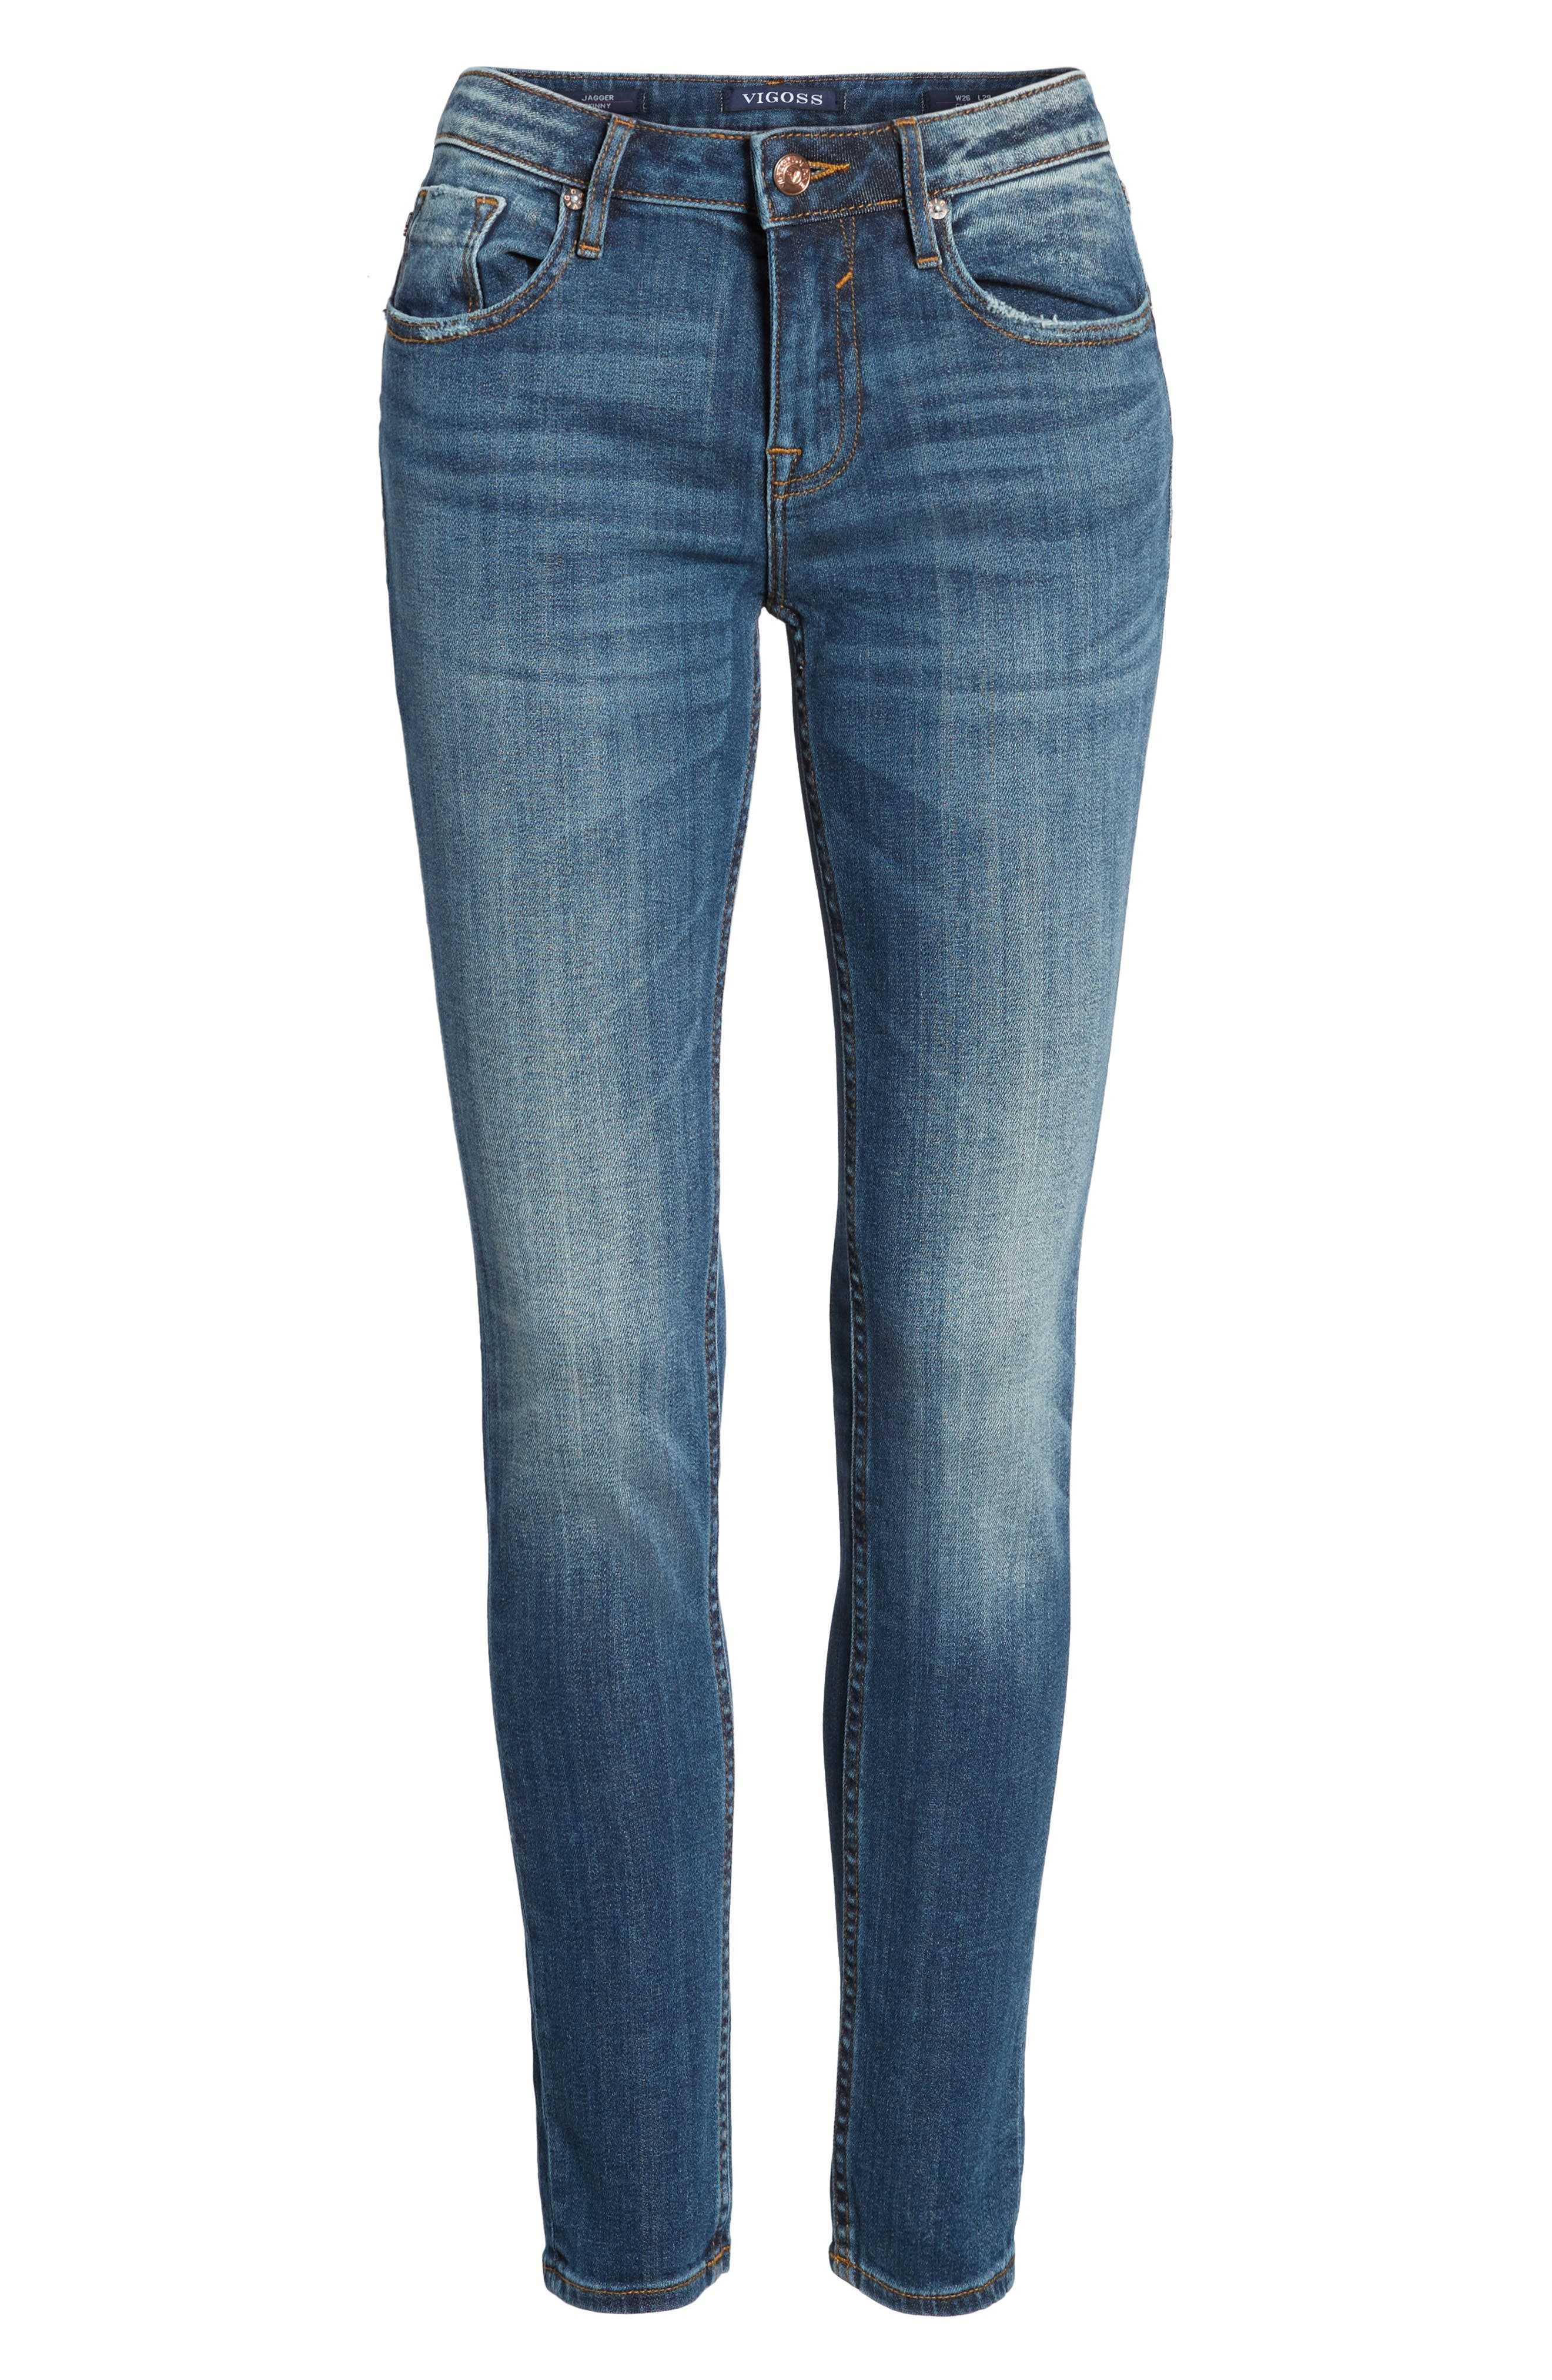 Jagger Skinny Jeans,                             Alternate thumbnail 7, color,                             Medium Wash